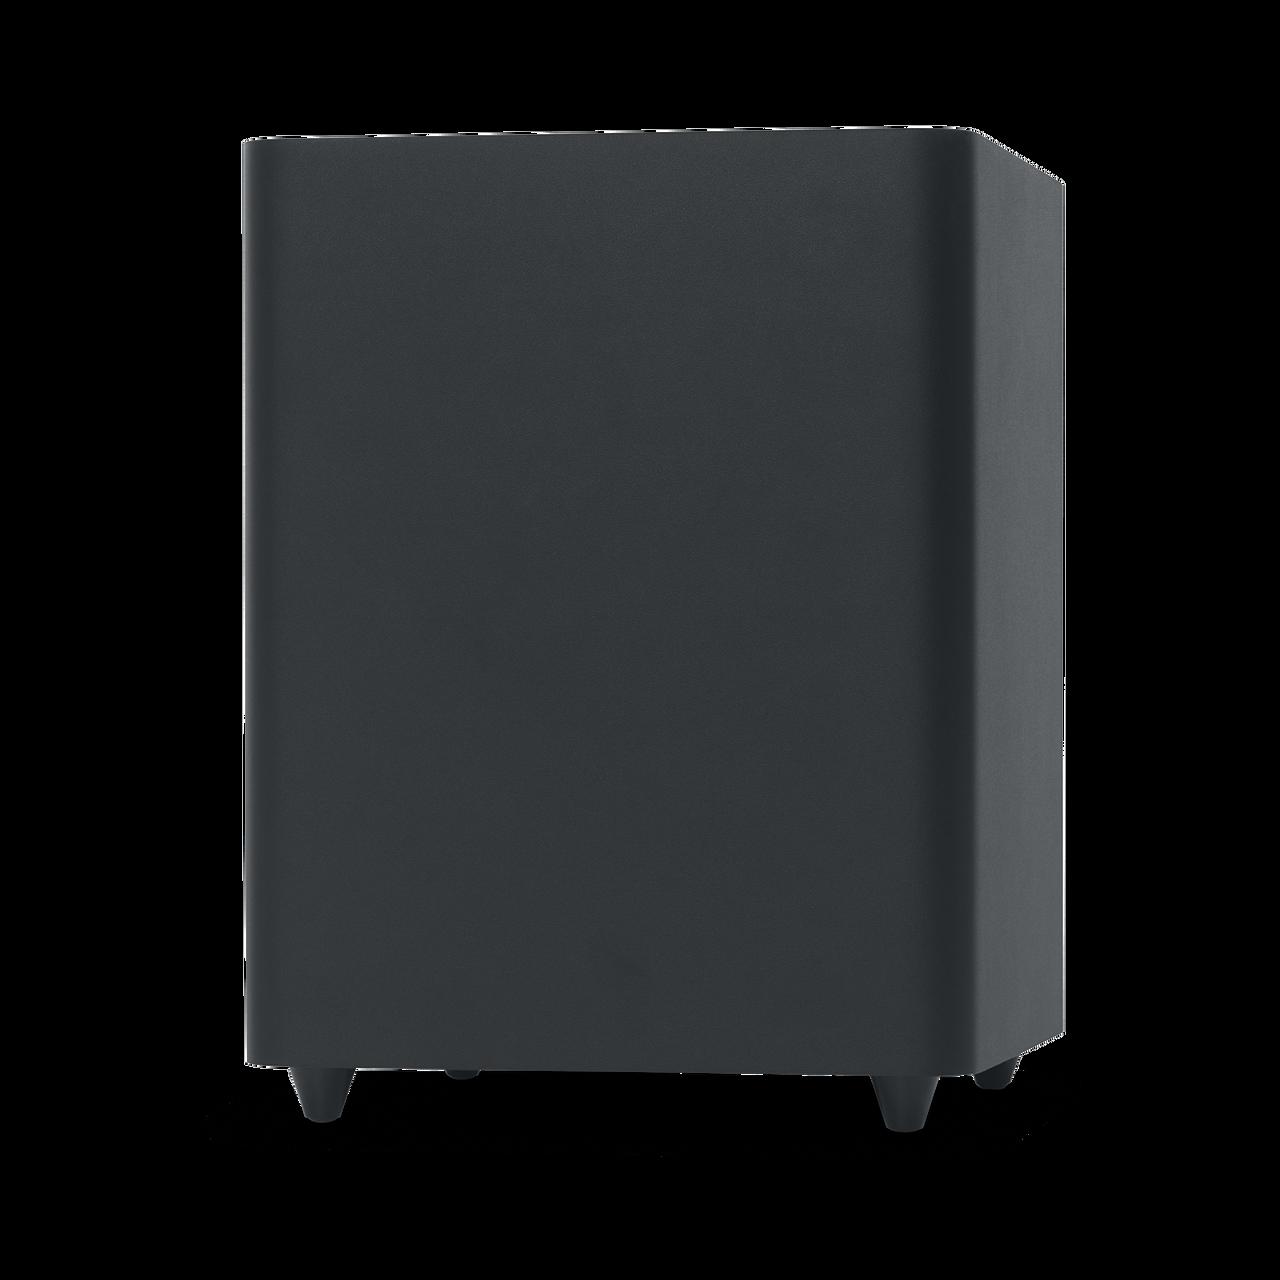 Harman Kardon HKSB20BLKAM-Z Soundbar Sub Woofer System – Refurbished